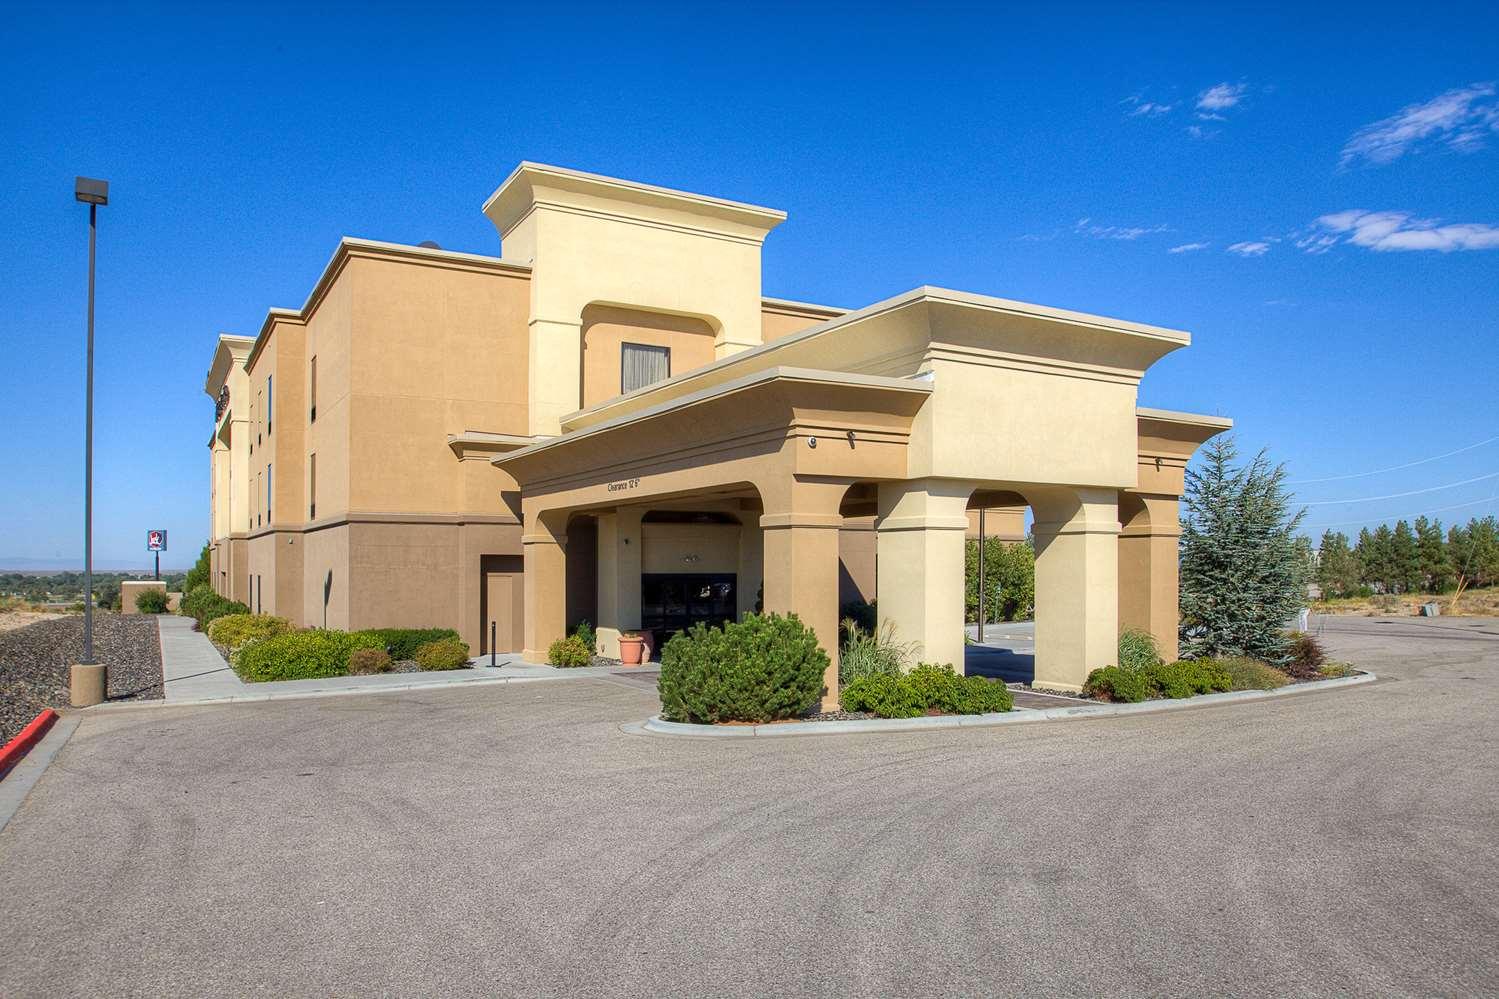 Hampton Inn - Suites Mountain Home